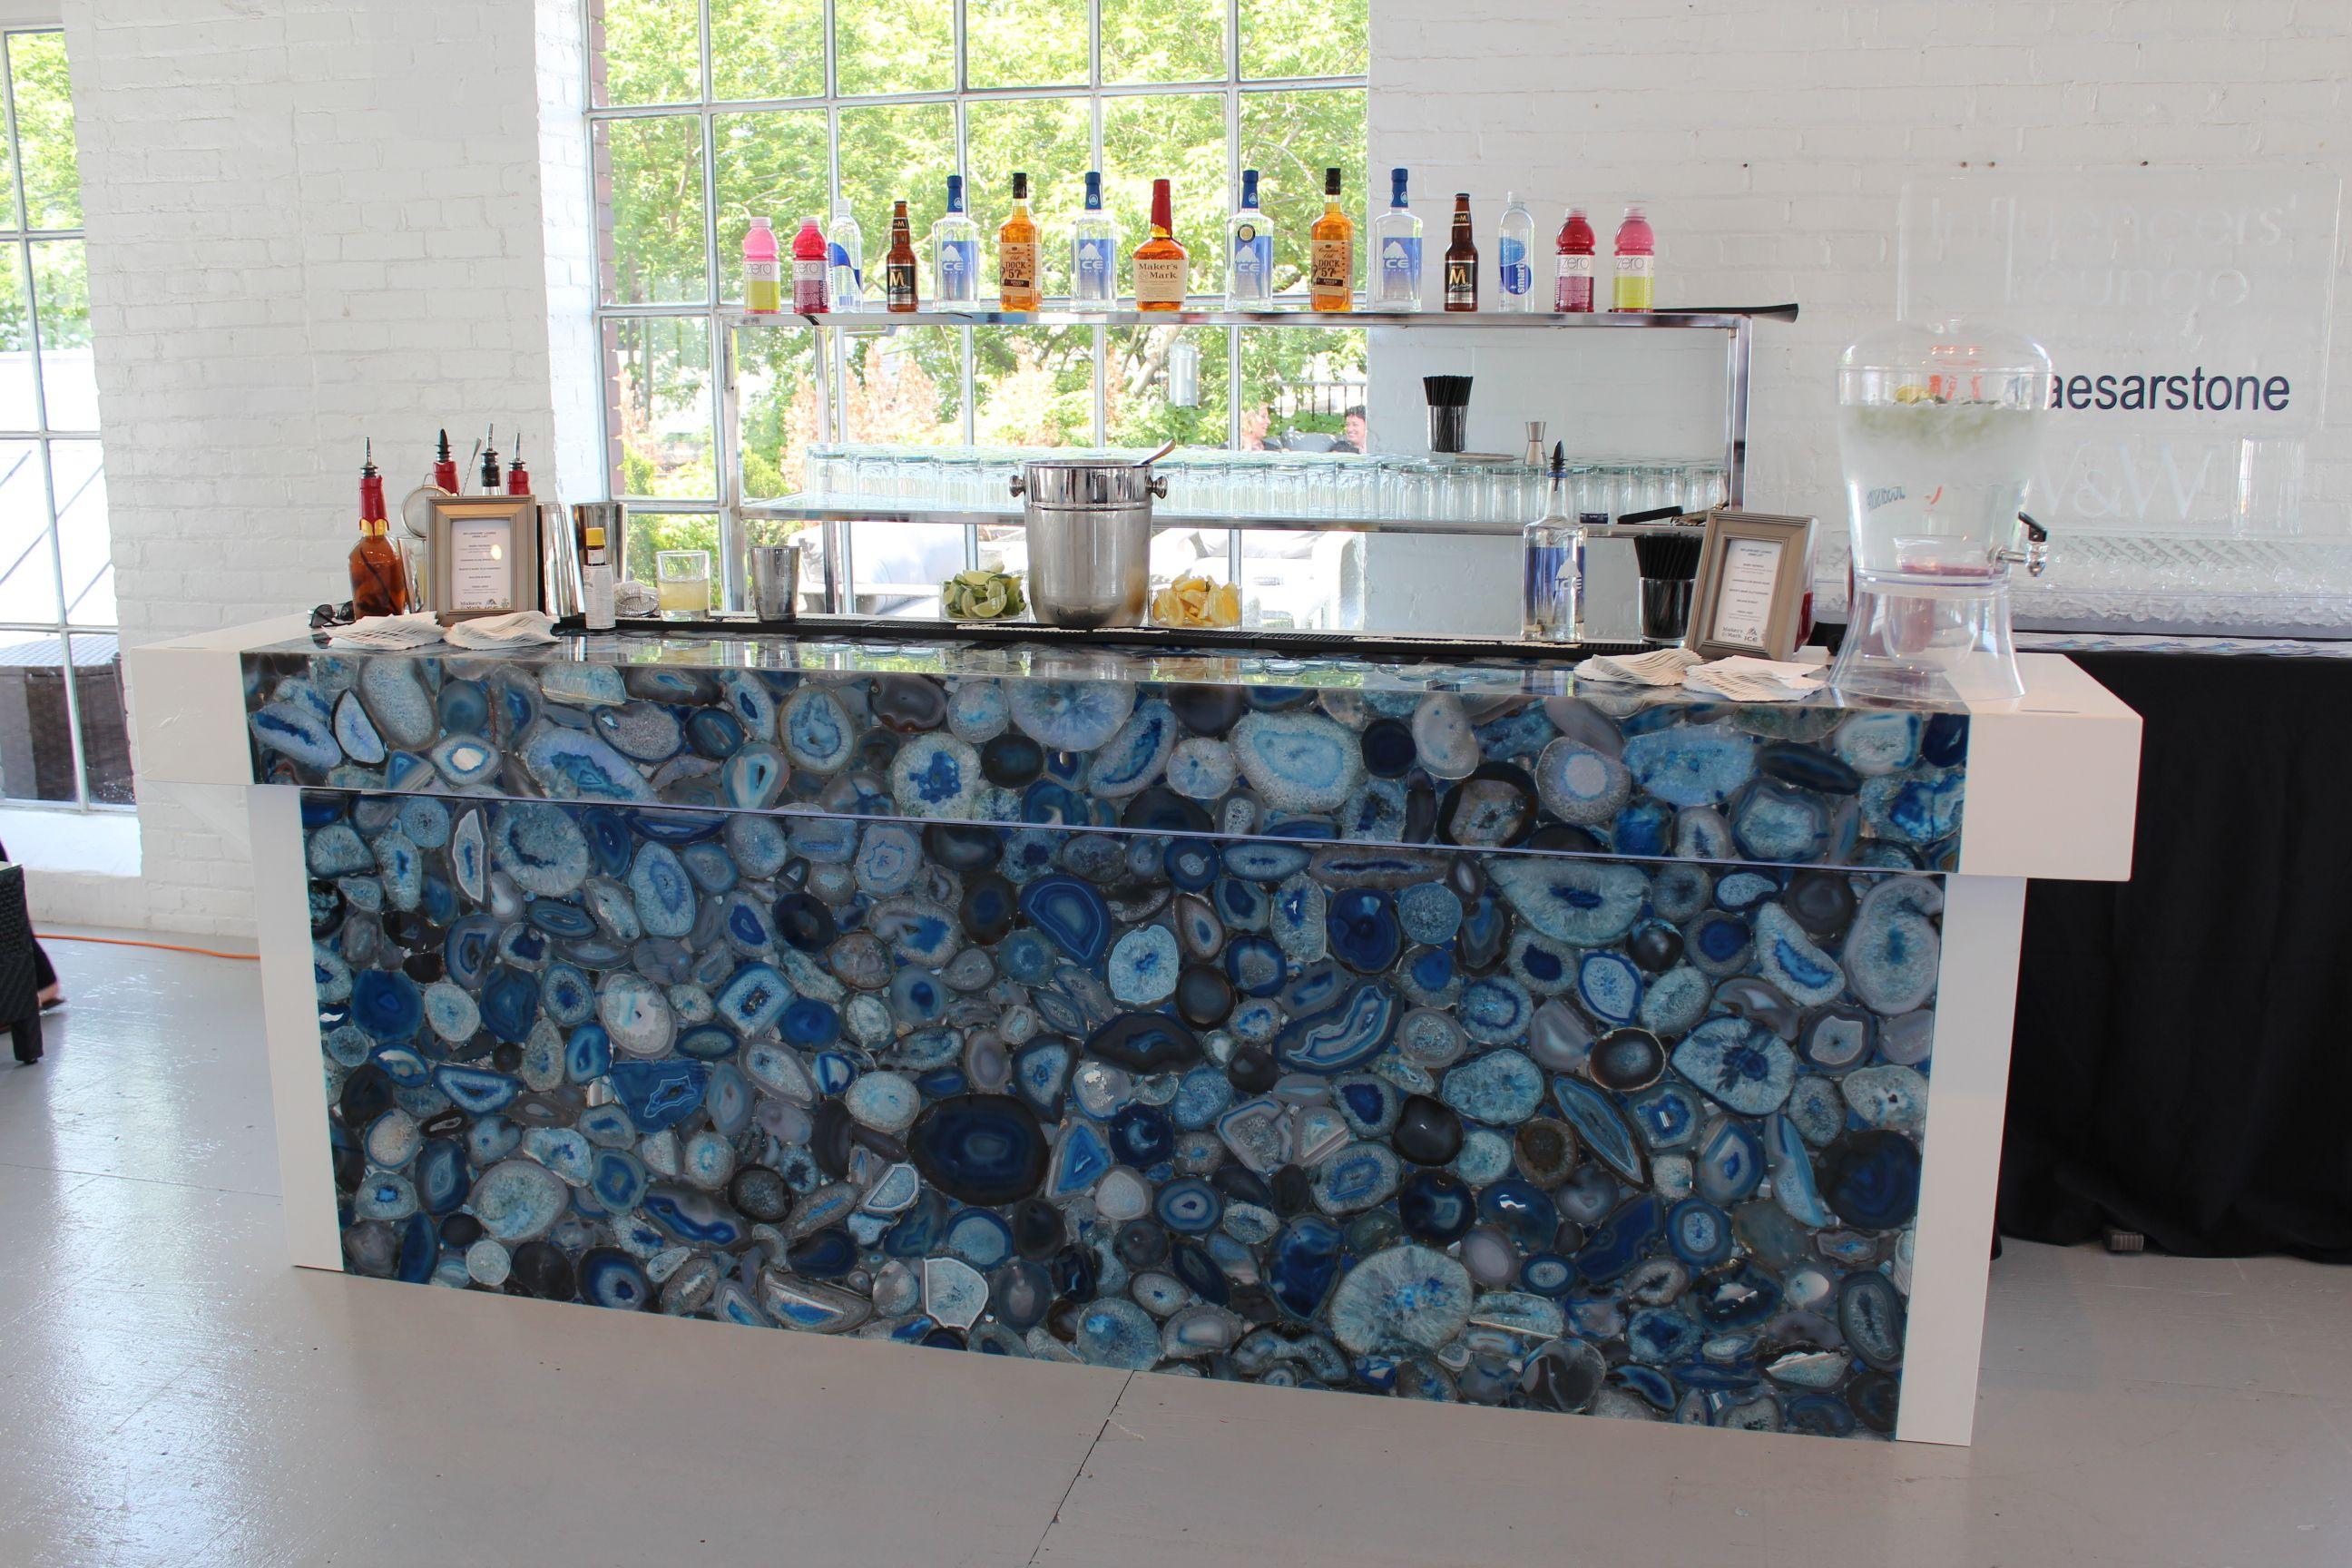 Caesarstone Concetto Blue Agate Bar Raise The Bar